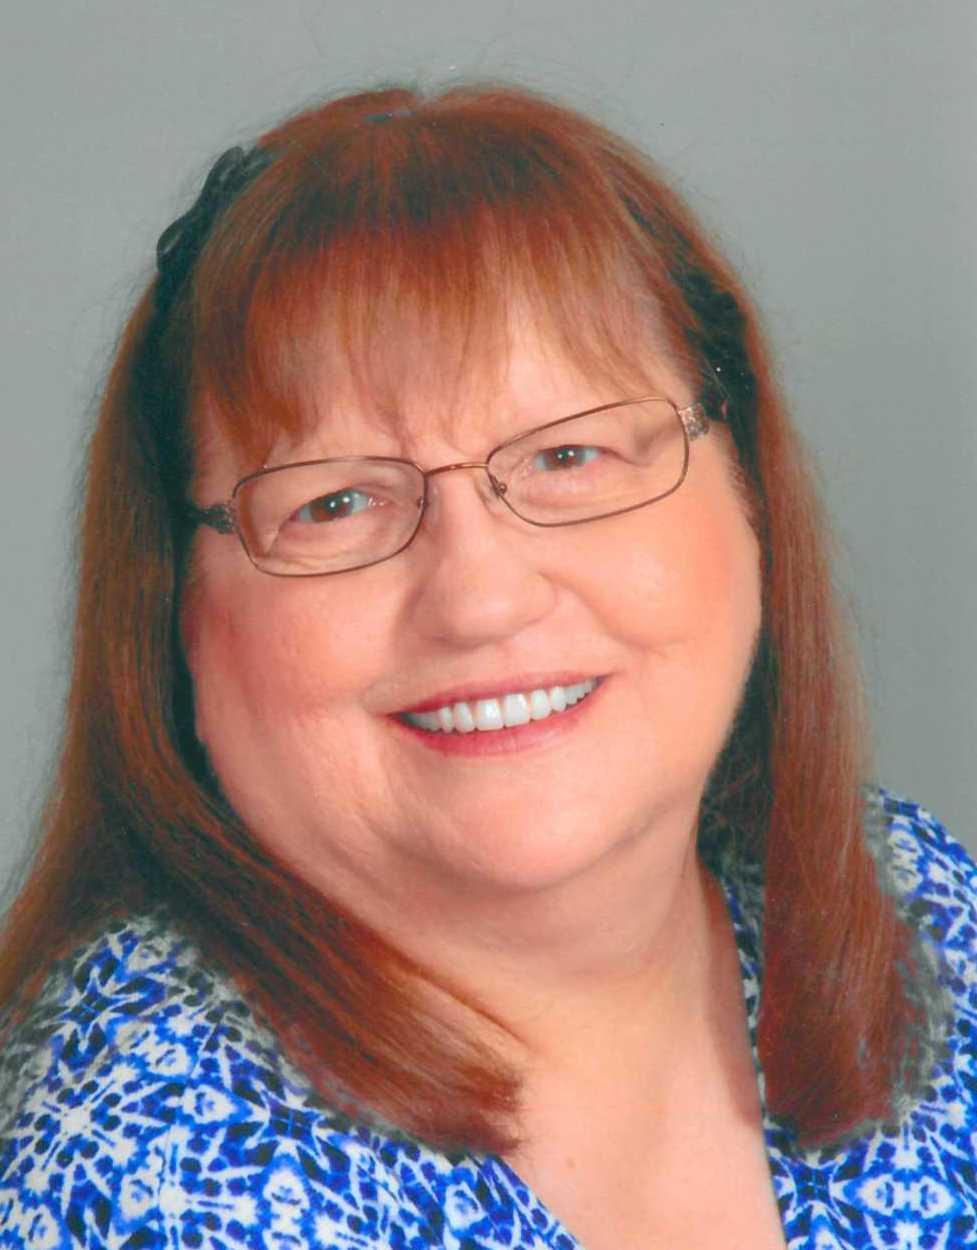 Linda L. Judd age 74